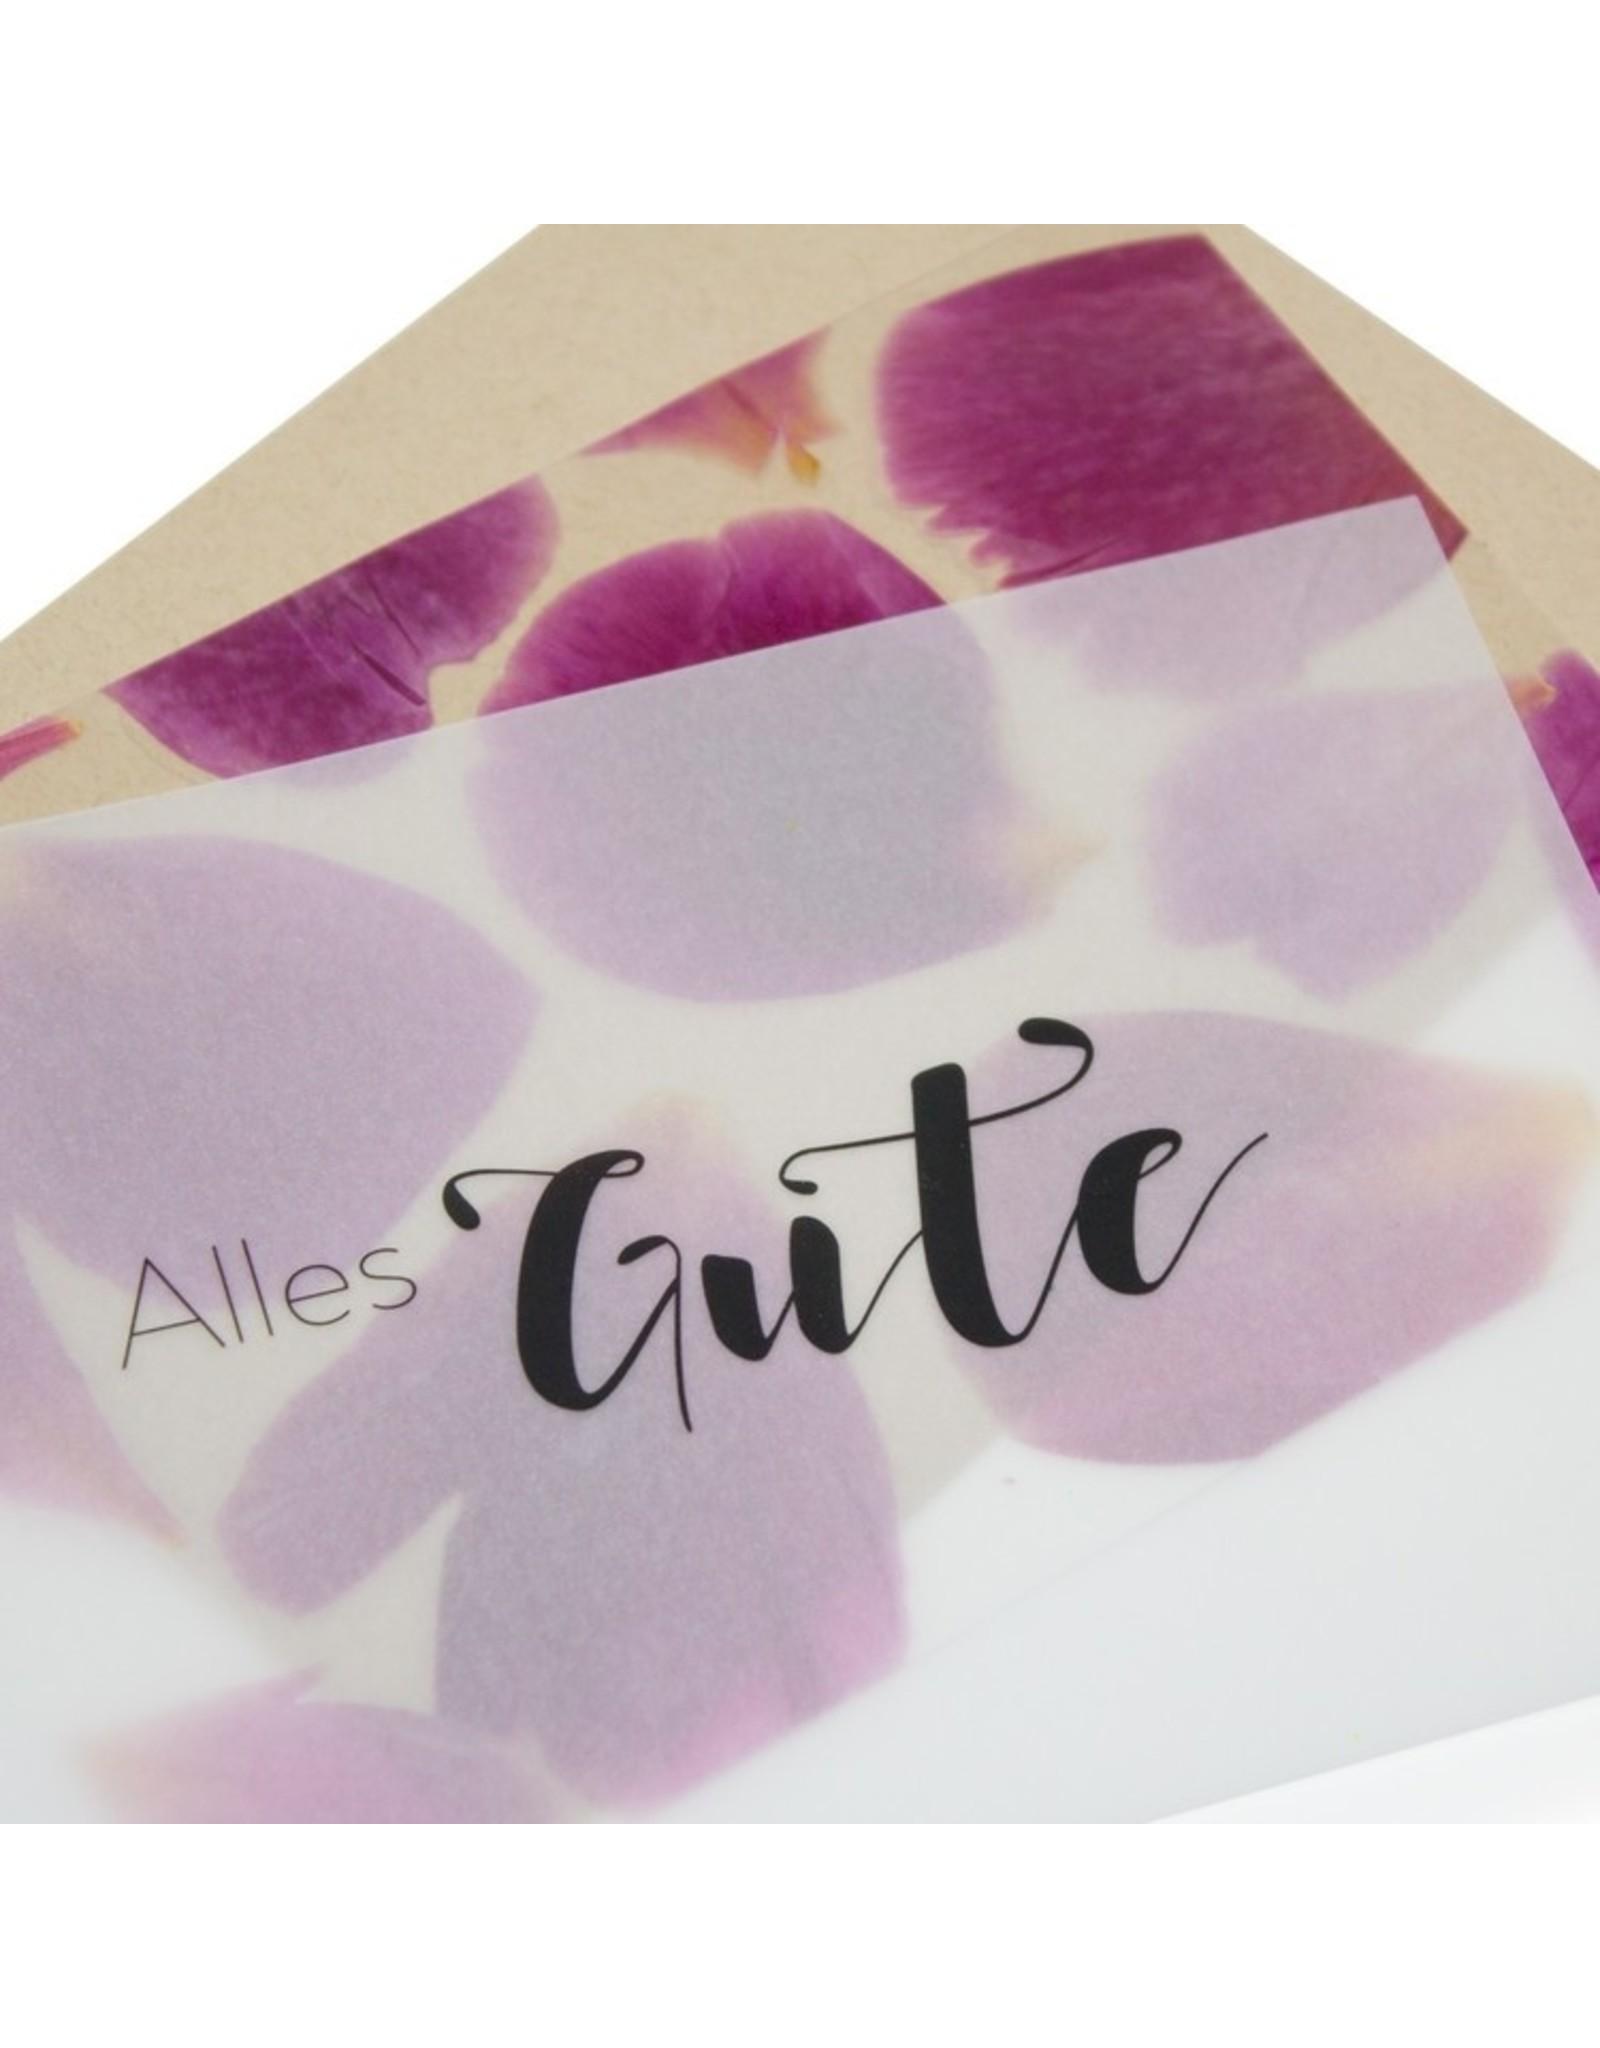 Fidea design Flower Press  Alles Gute